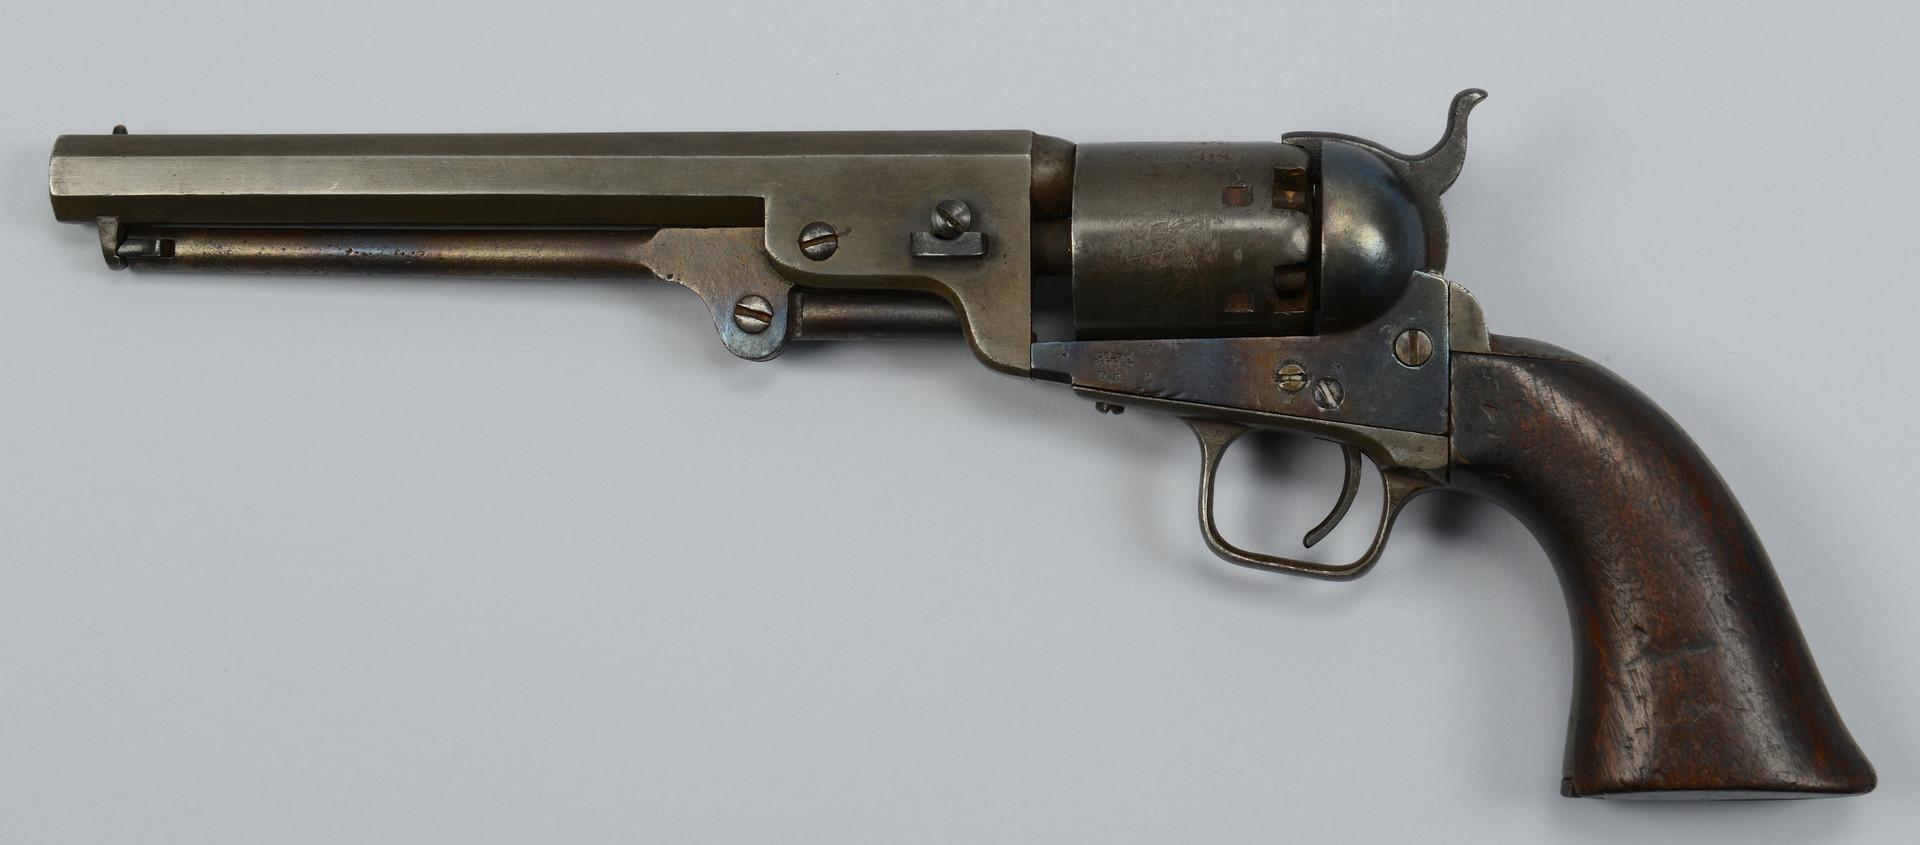 Lot 114: U.S. Colt Navy Model 1851, 3rd Model